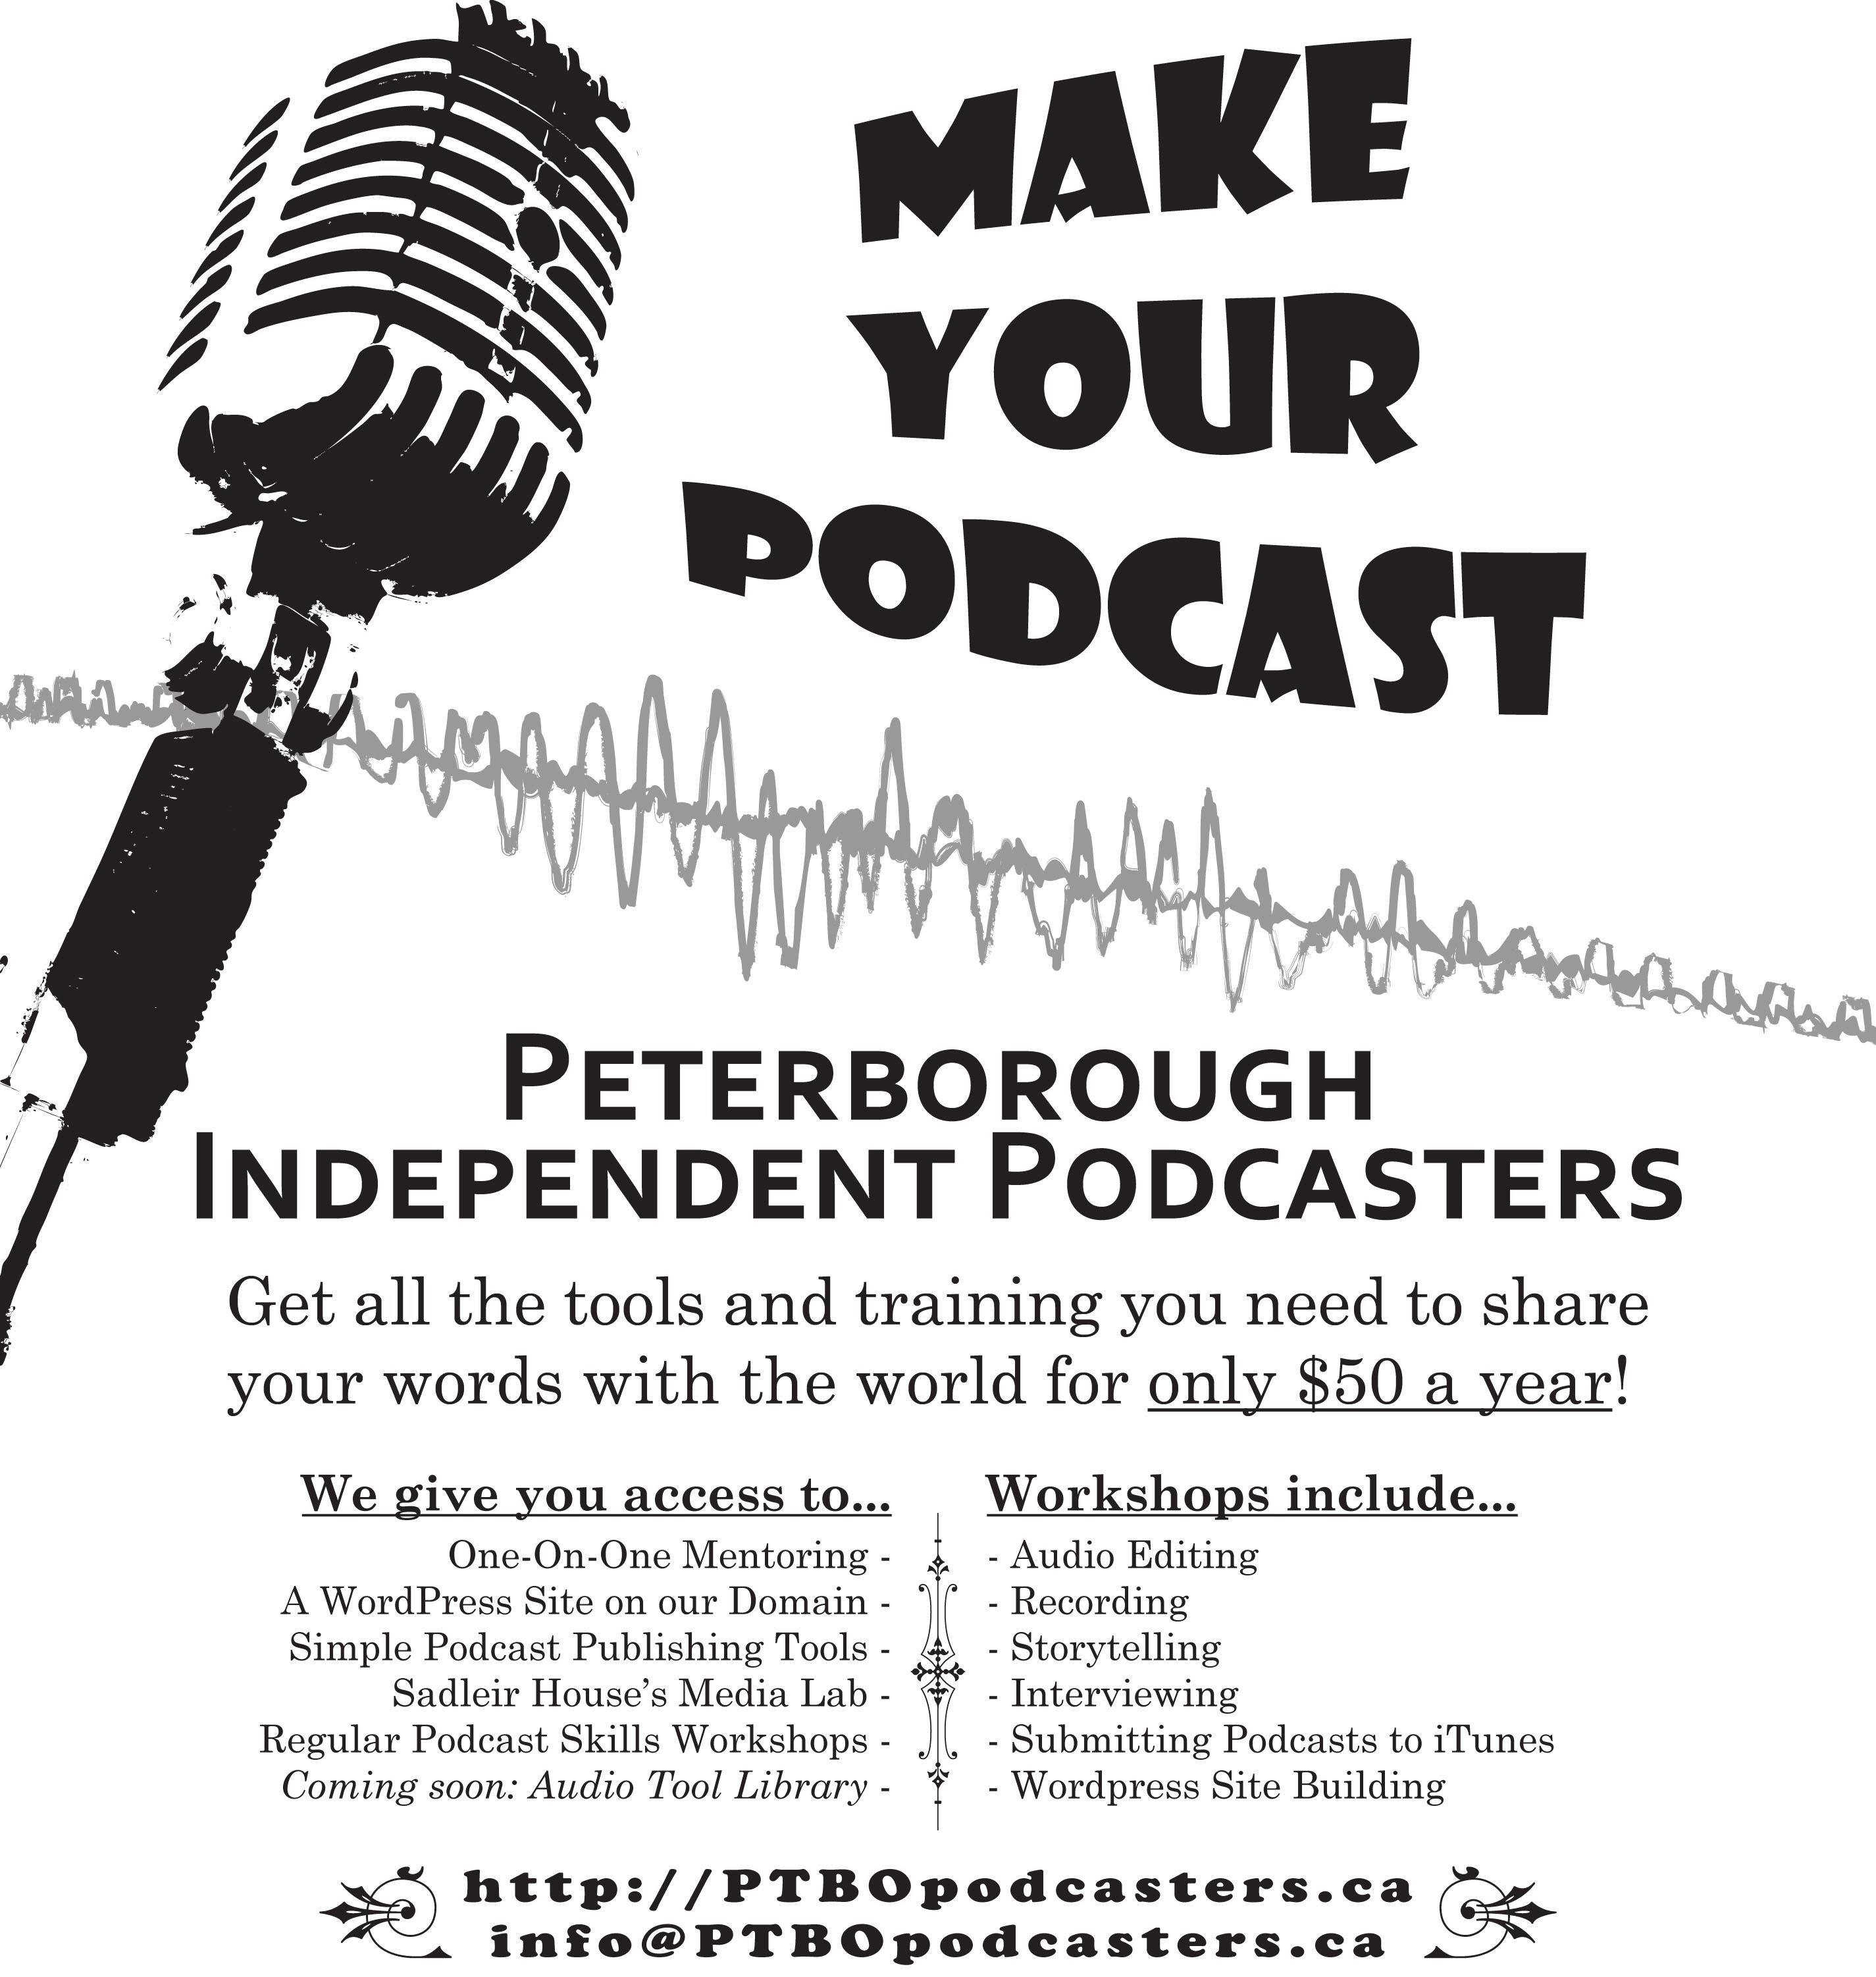 Podcasting happens in Peterborough!